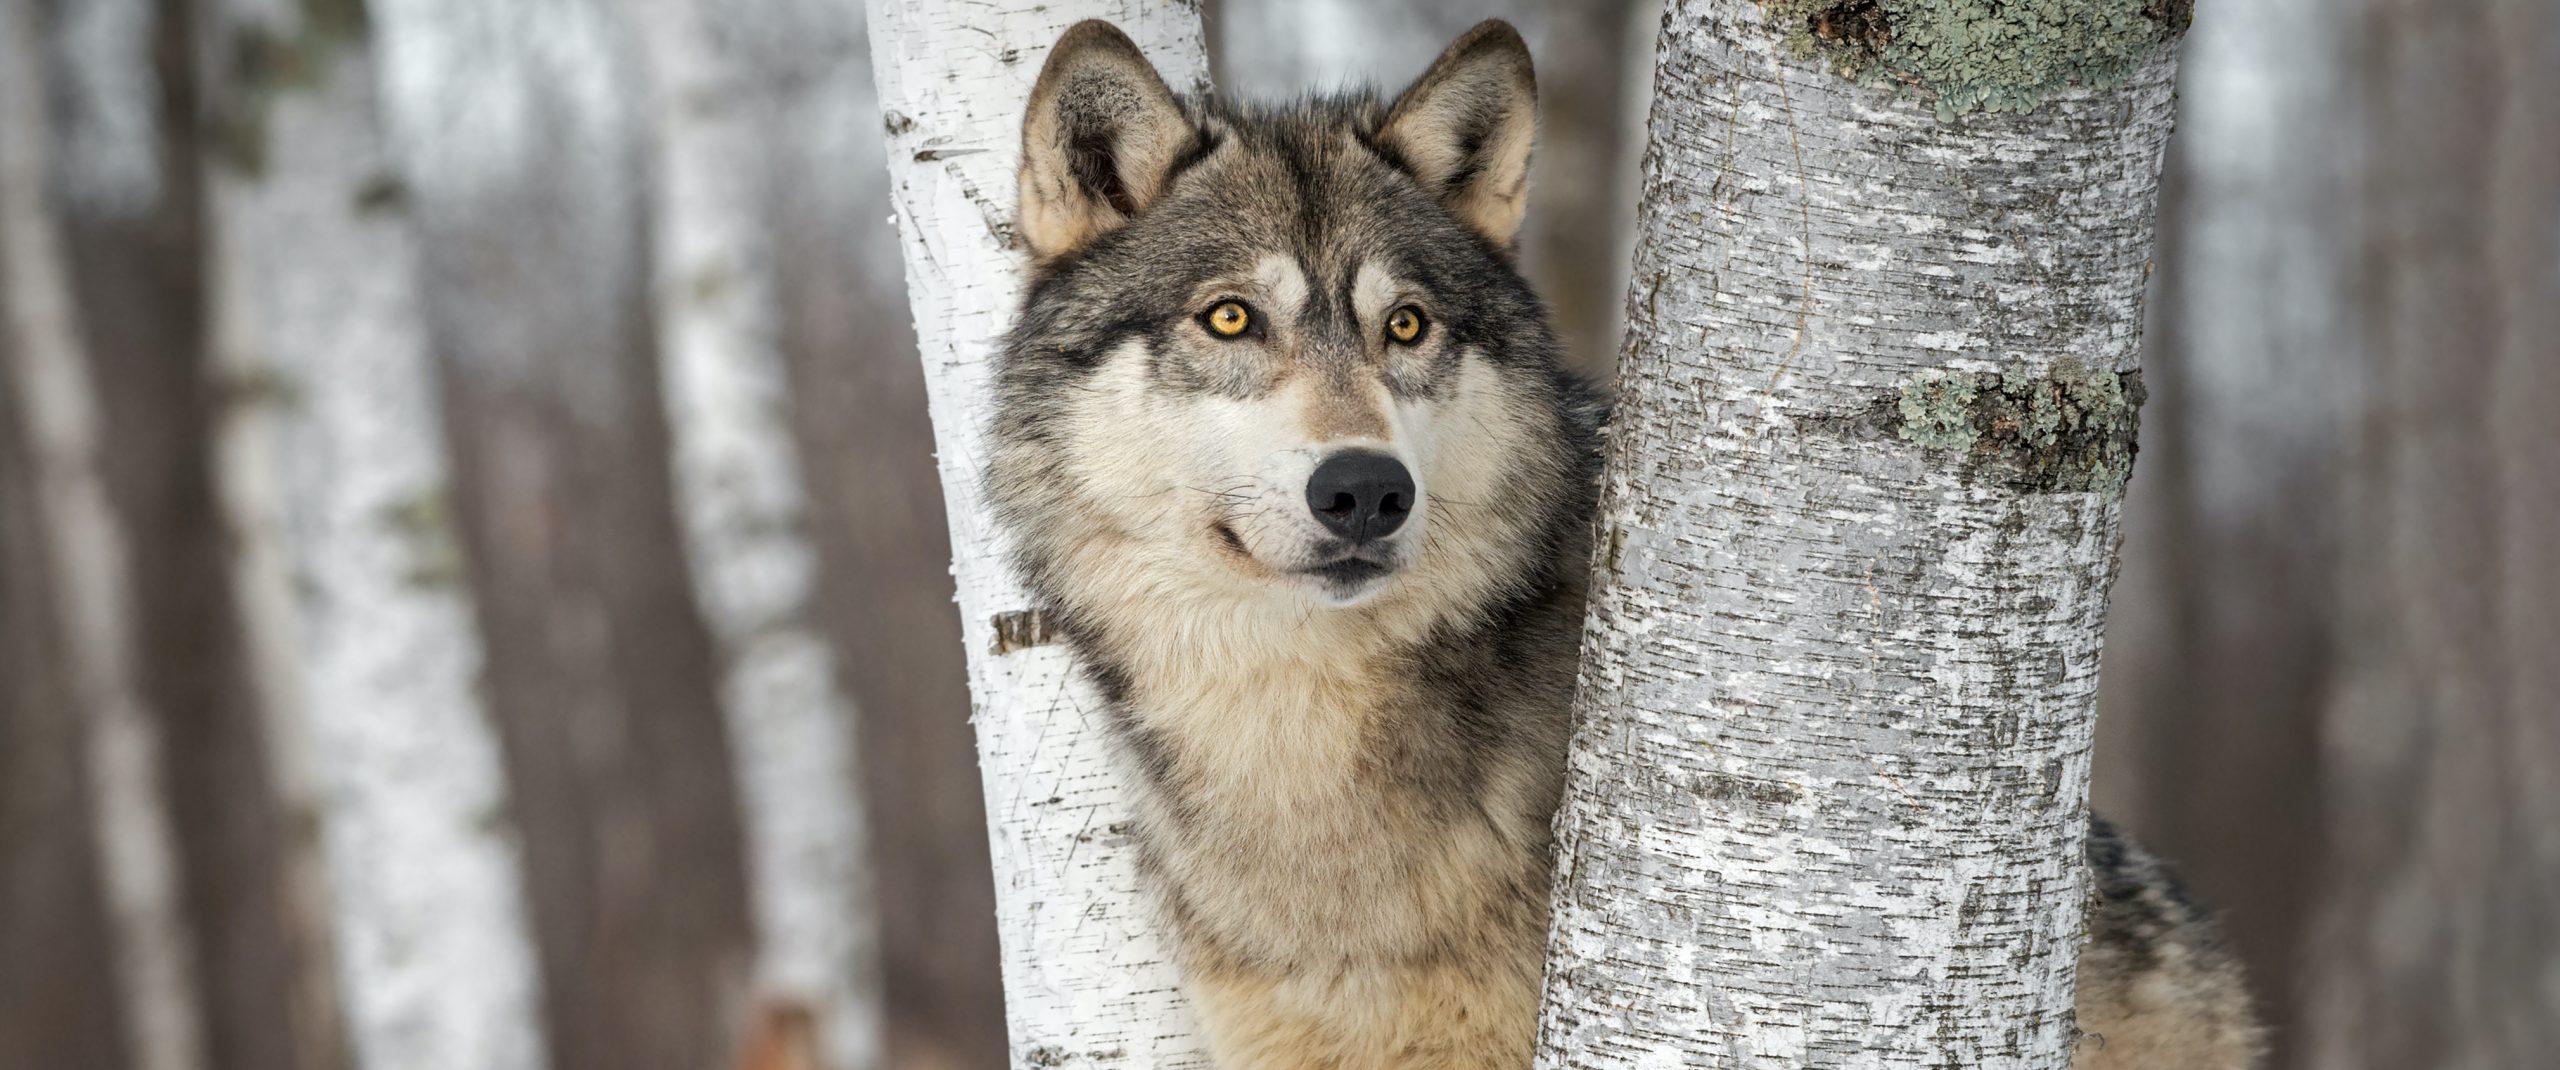 Wil jij ook wolven en jakhalzen leren temmen?